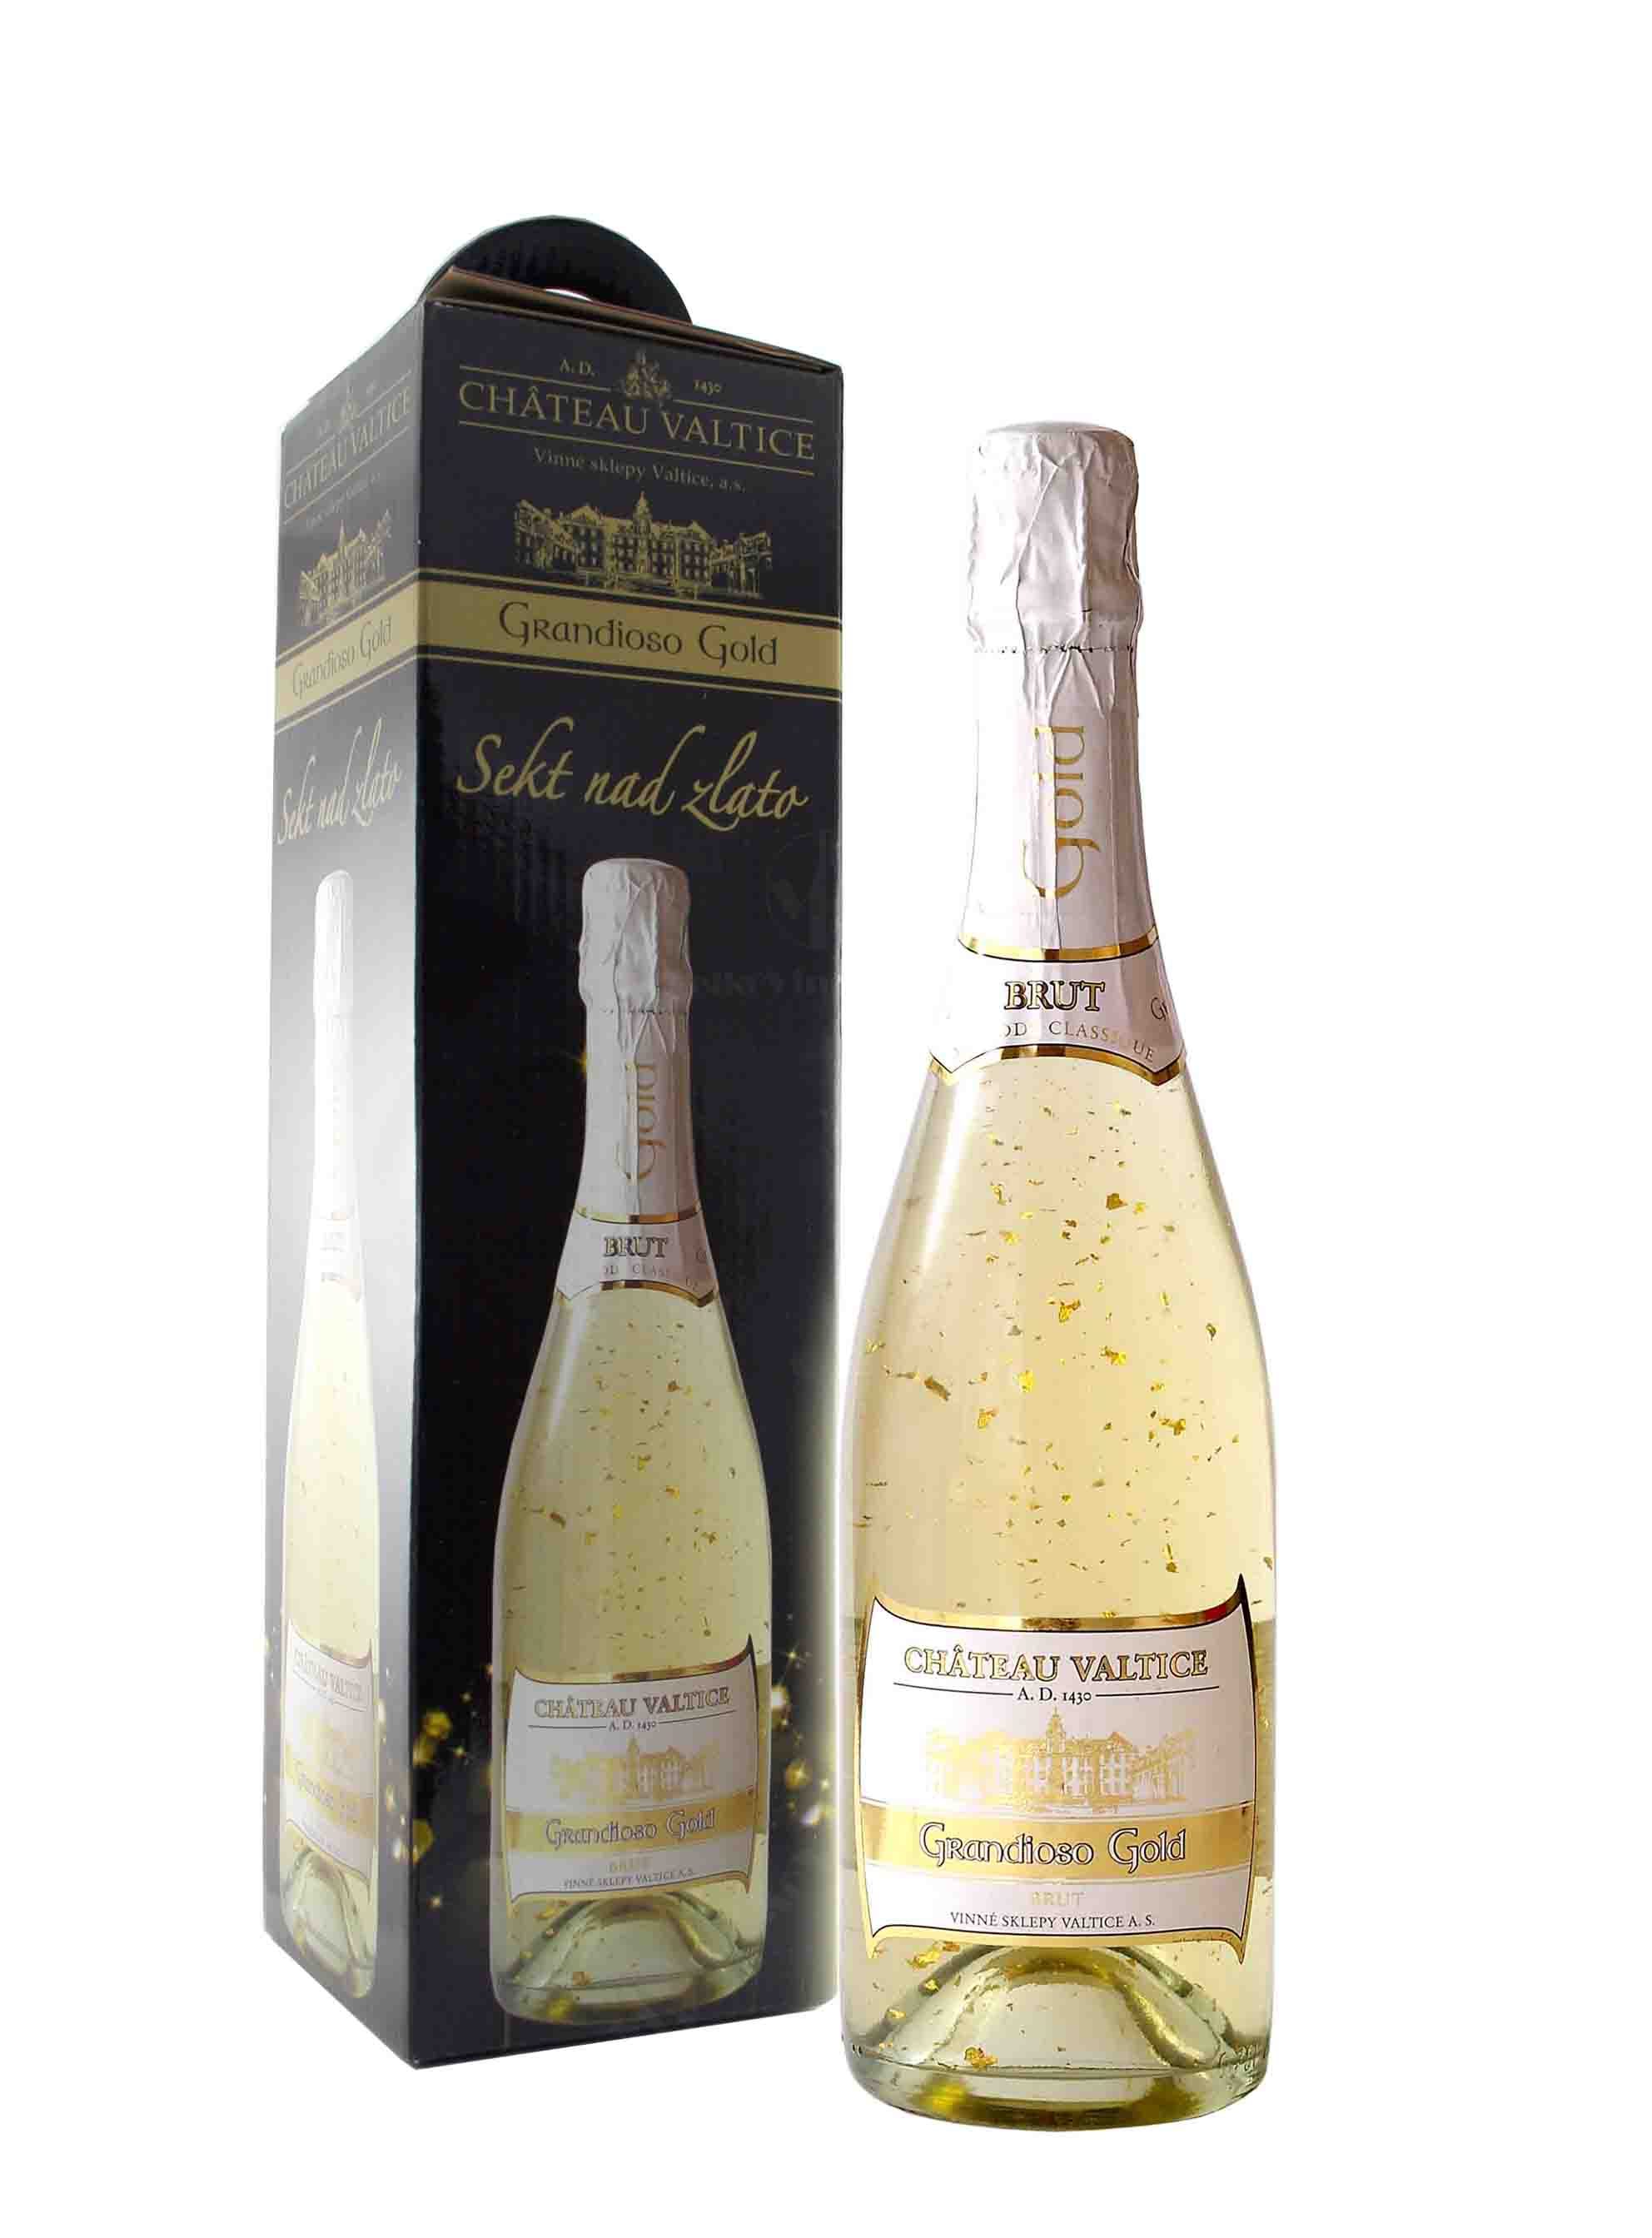 Sekt, Grandioso Gold, Château Valtice, 0.75 l